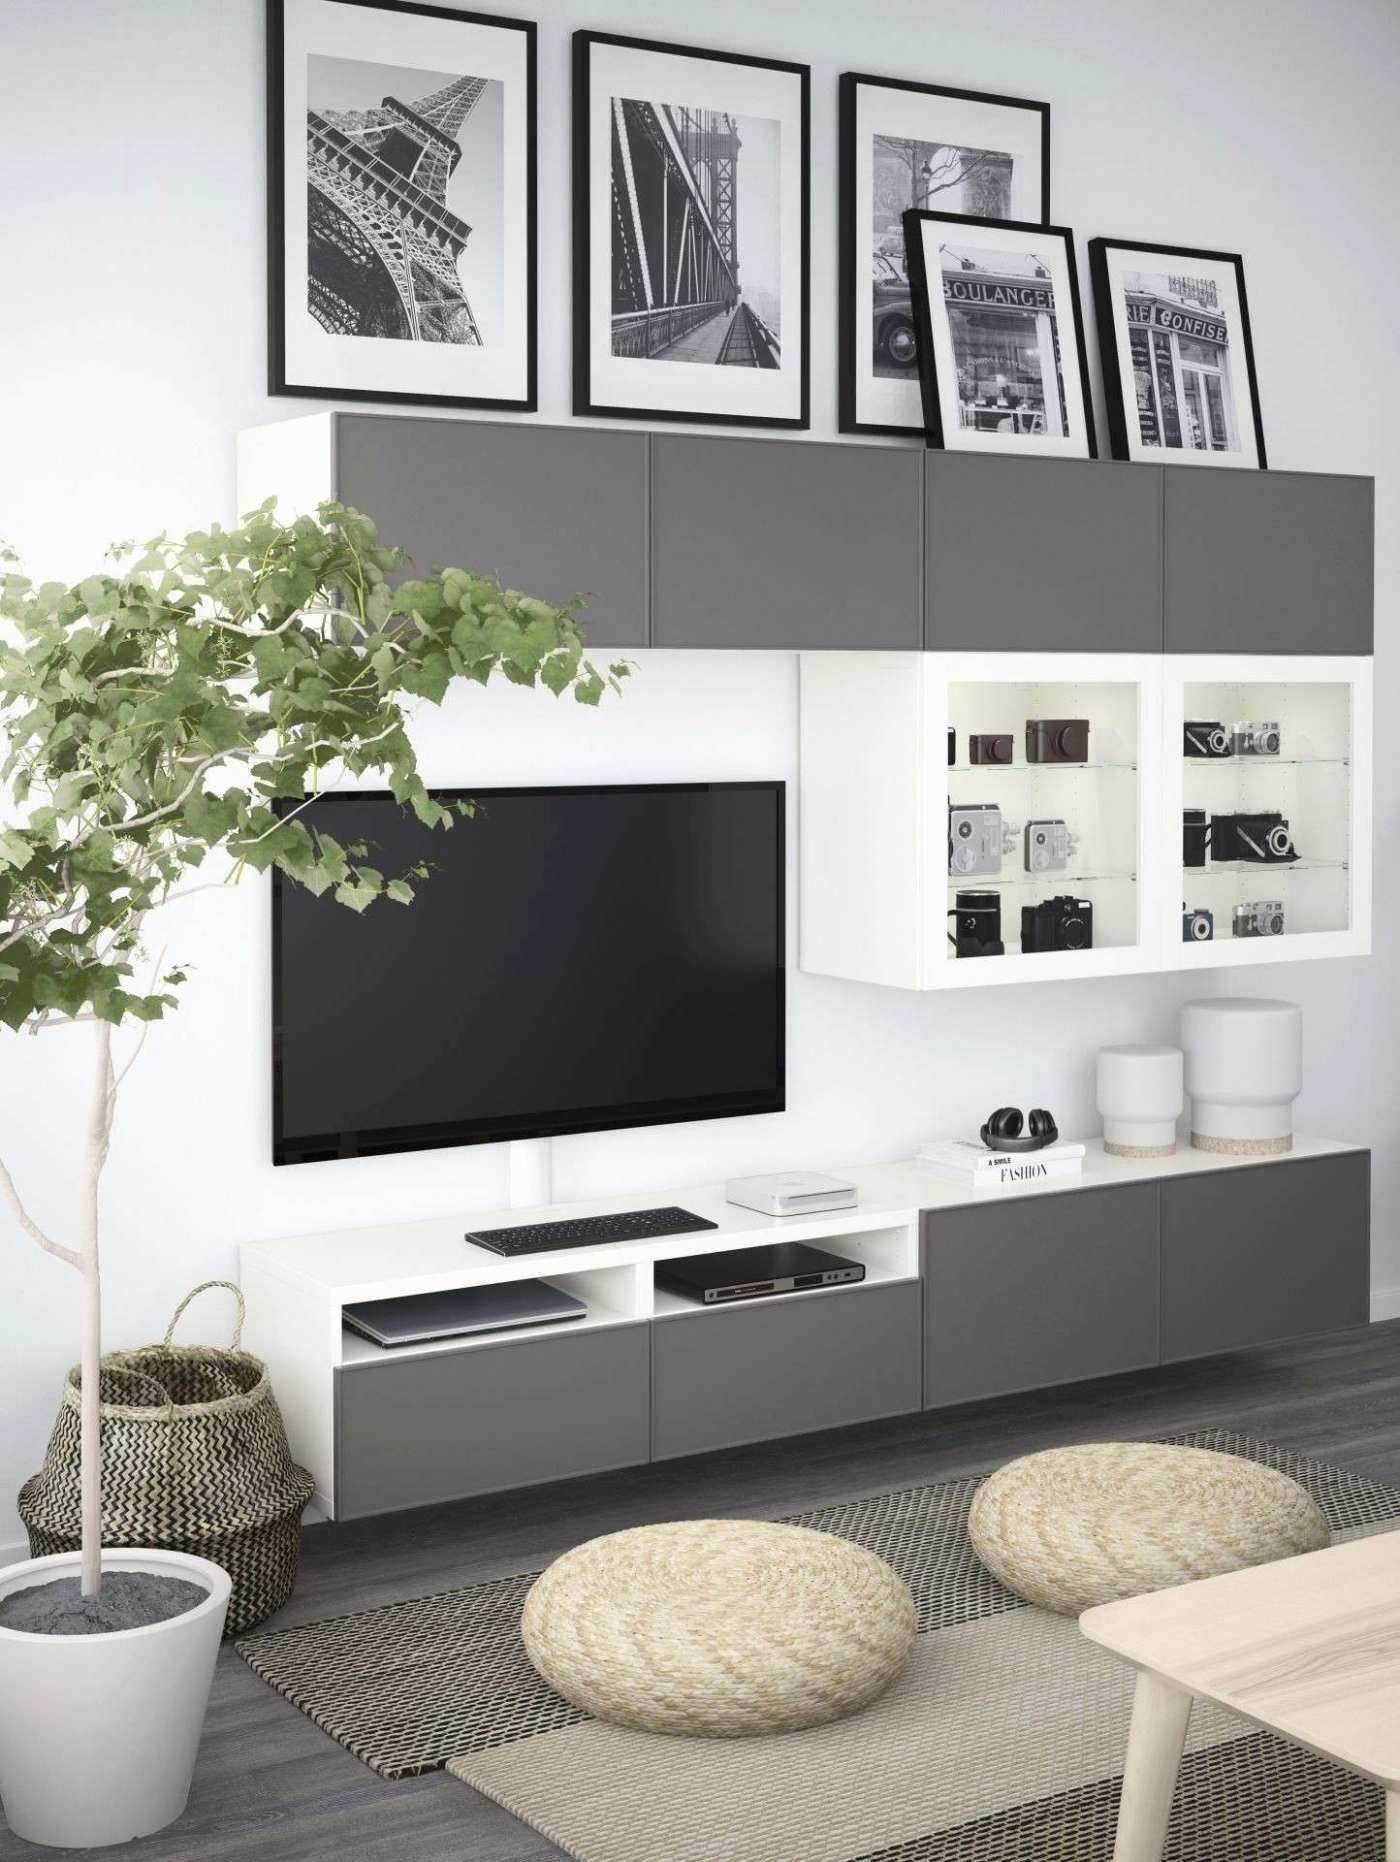 deko wohnzimmer modern genial 55 genial deko ideen selbermachen wohnzimmer neu of deko wohnzimmer modern